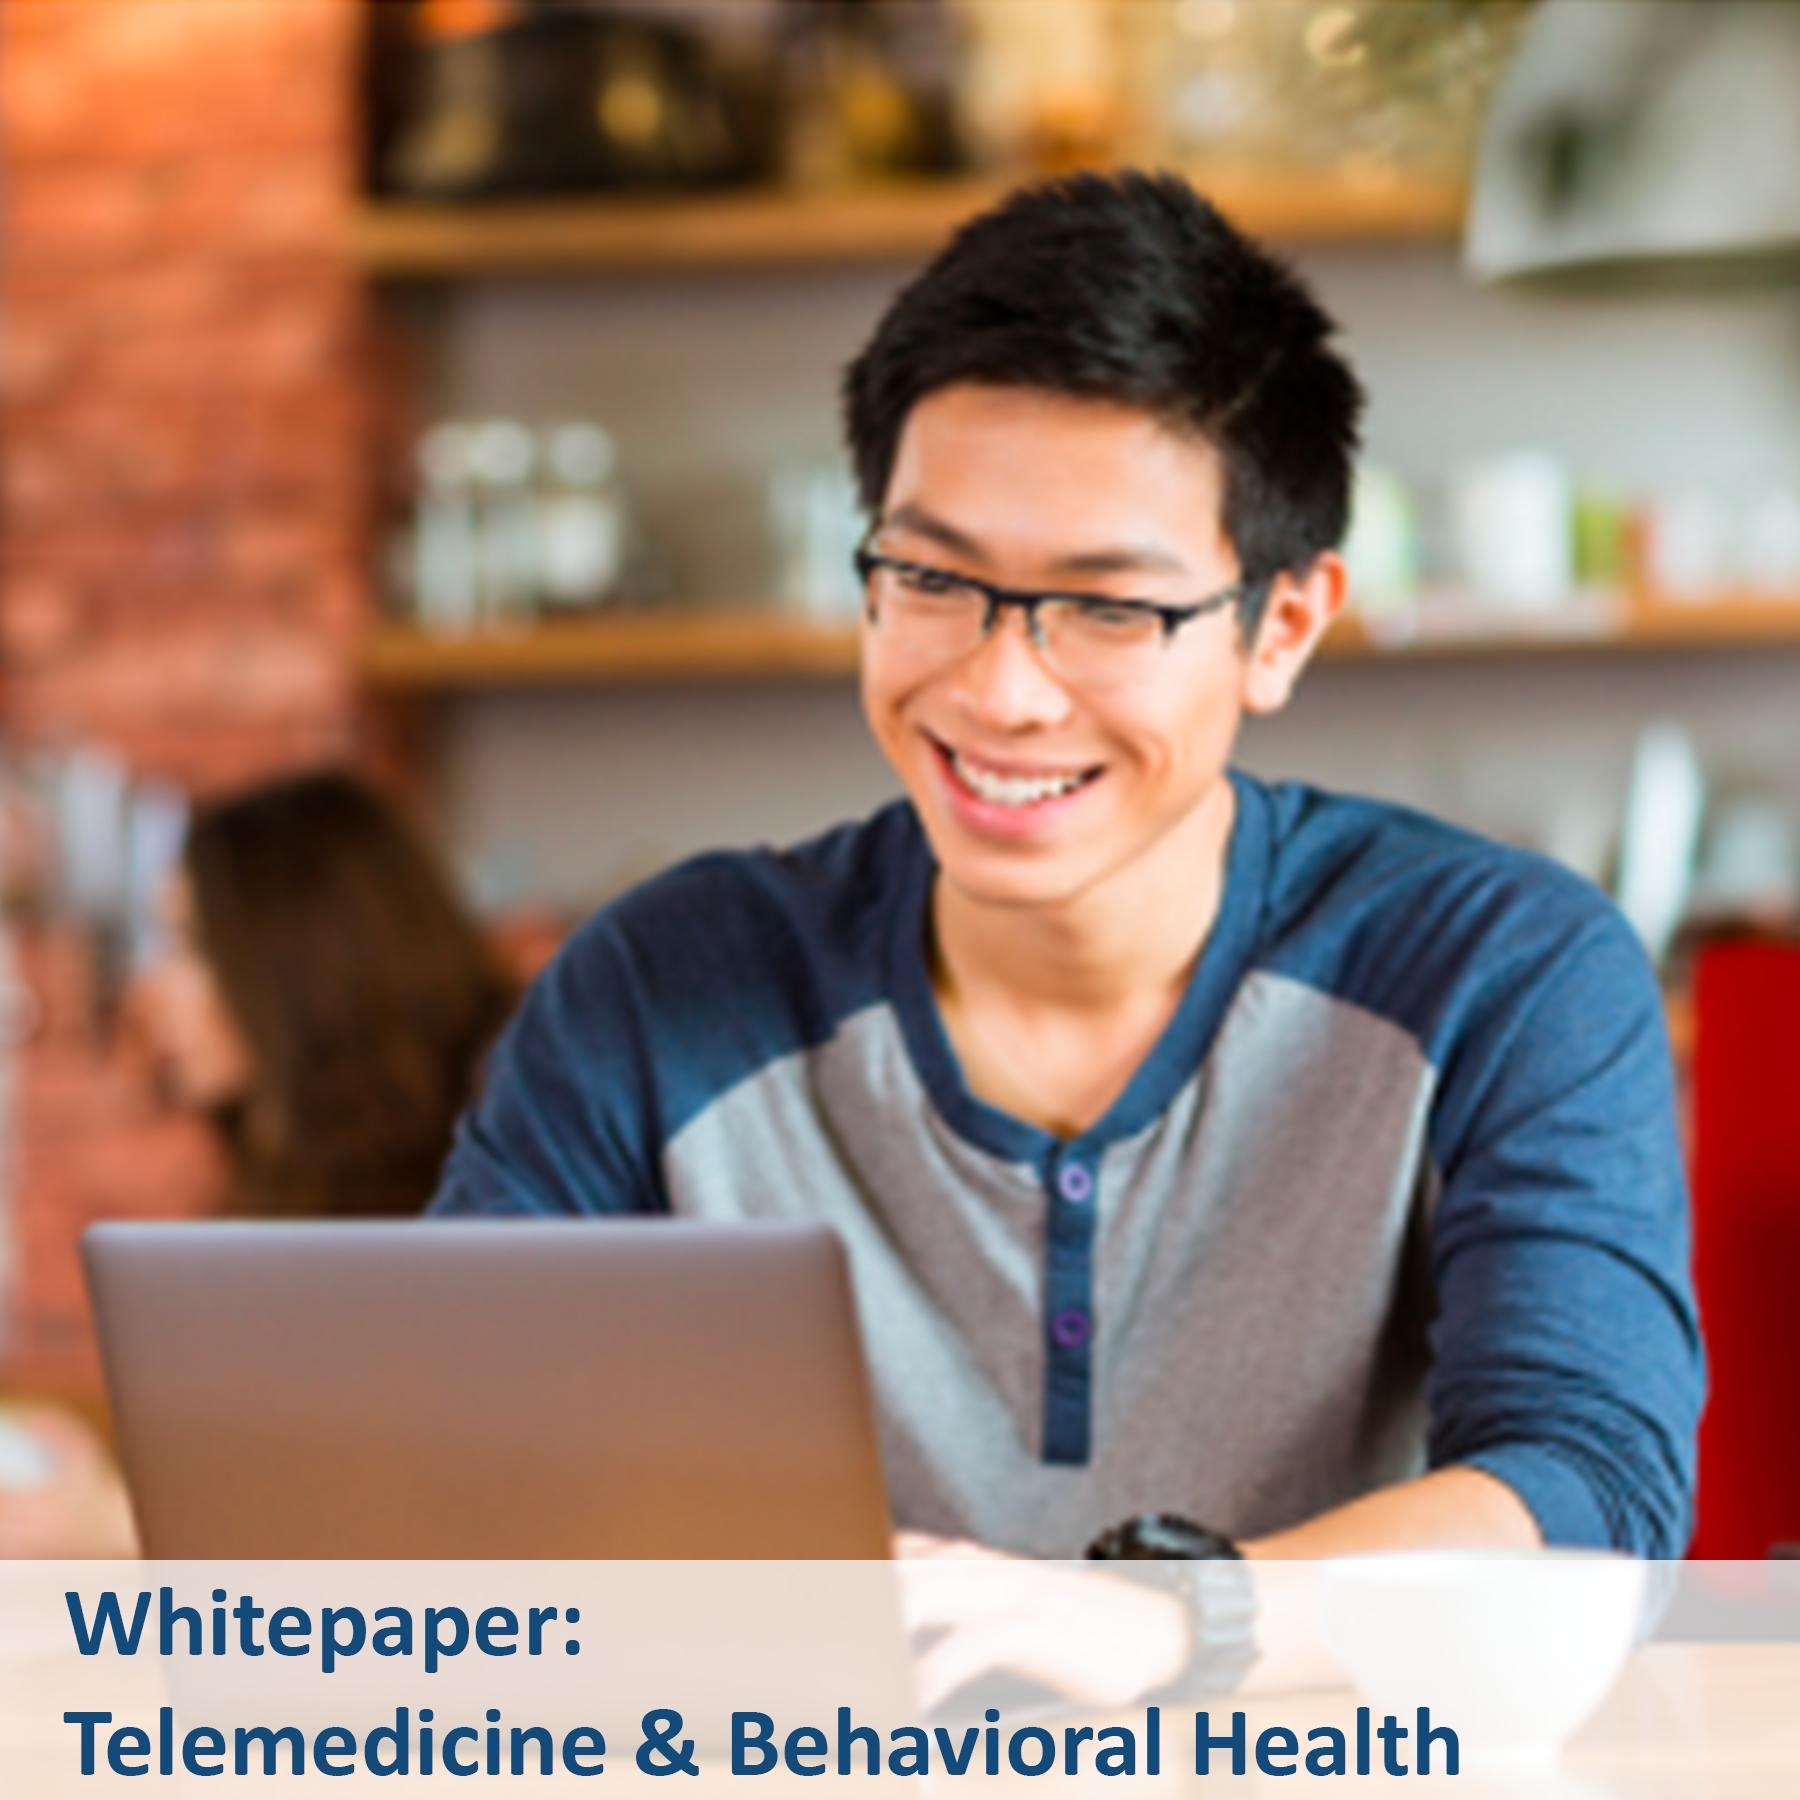 Whitepaper - Telemedicine & Behavioral Health